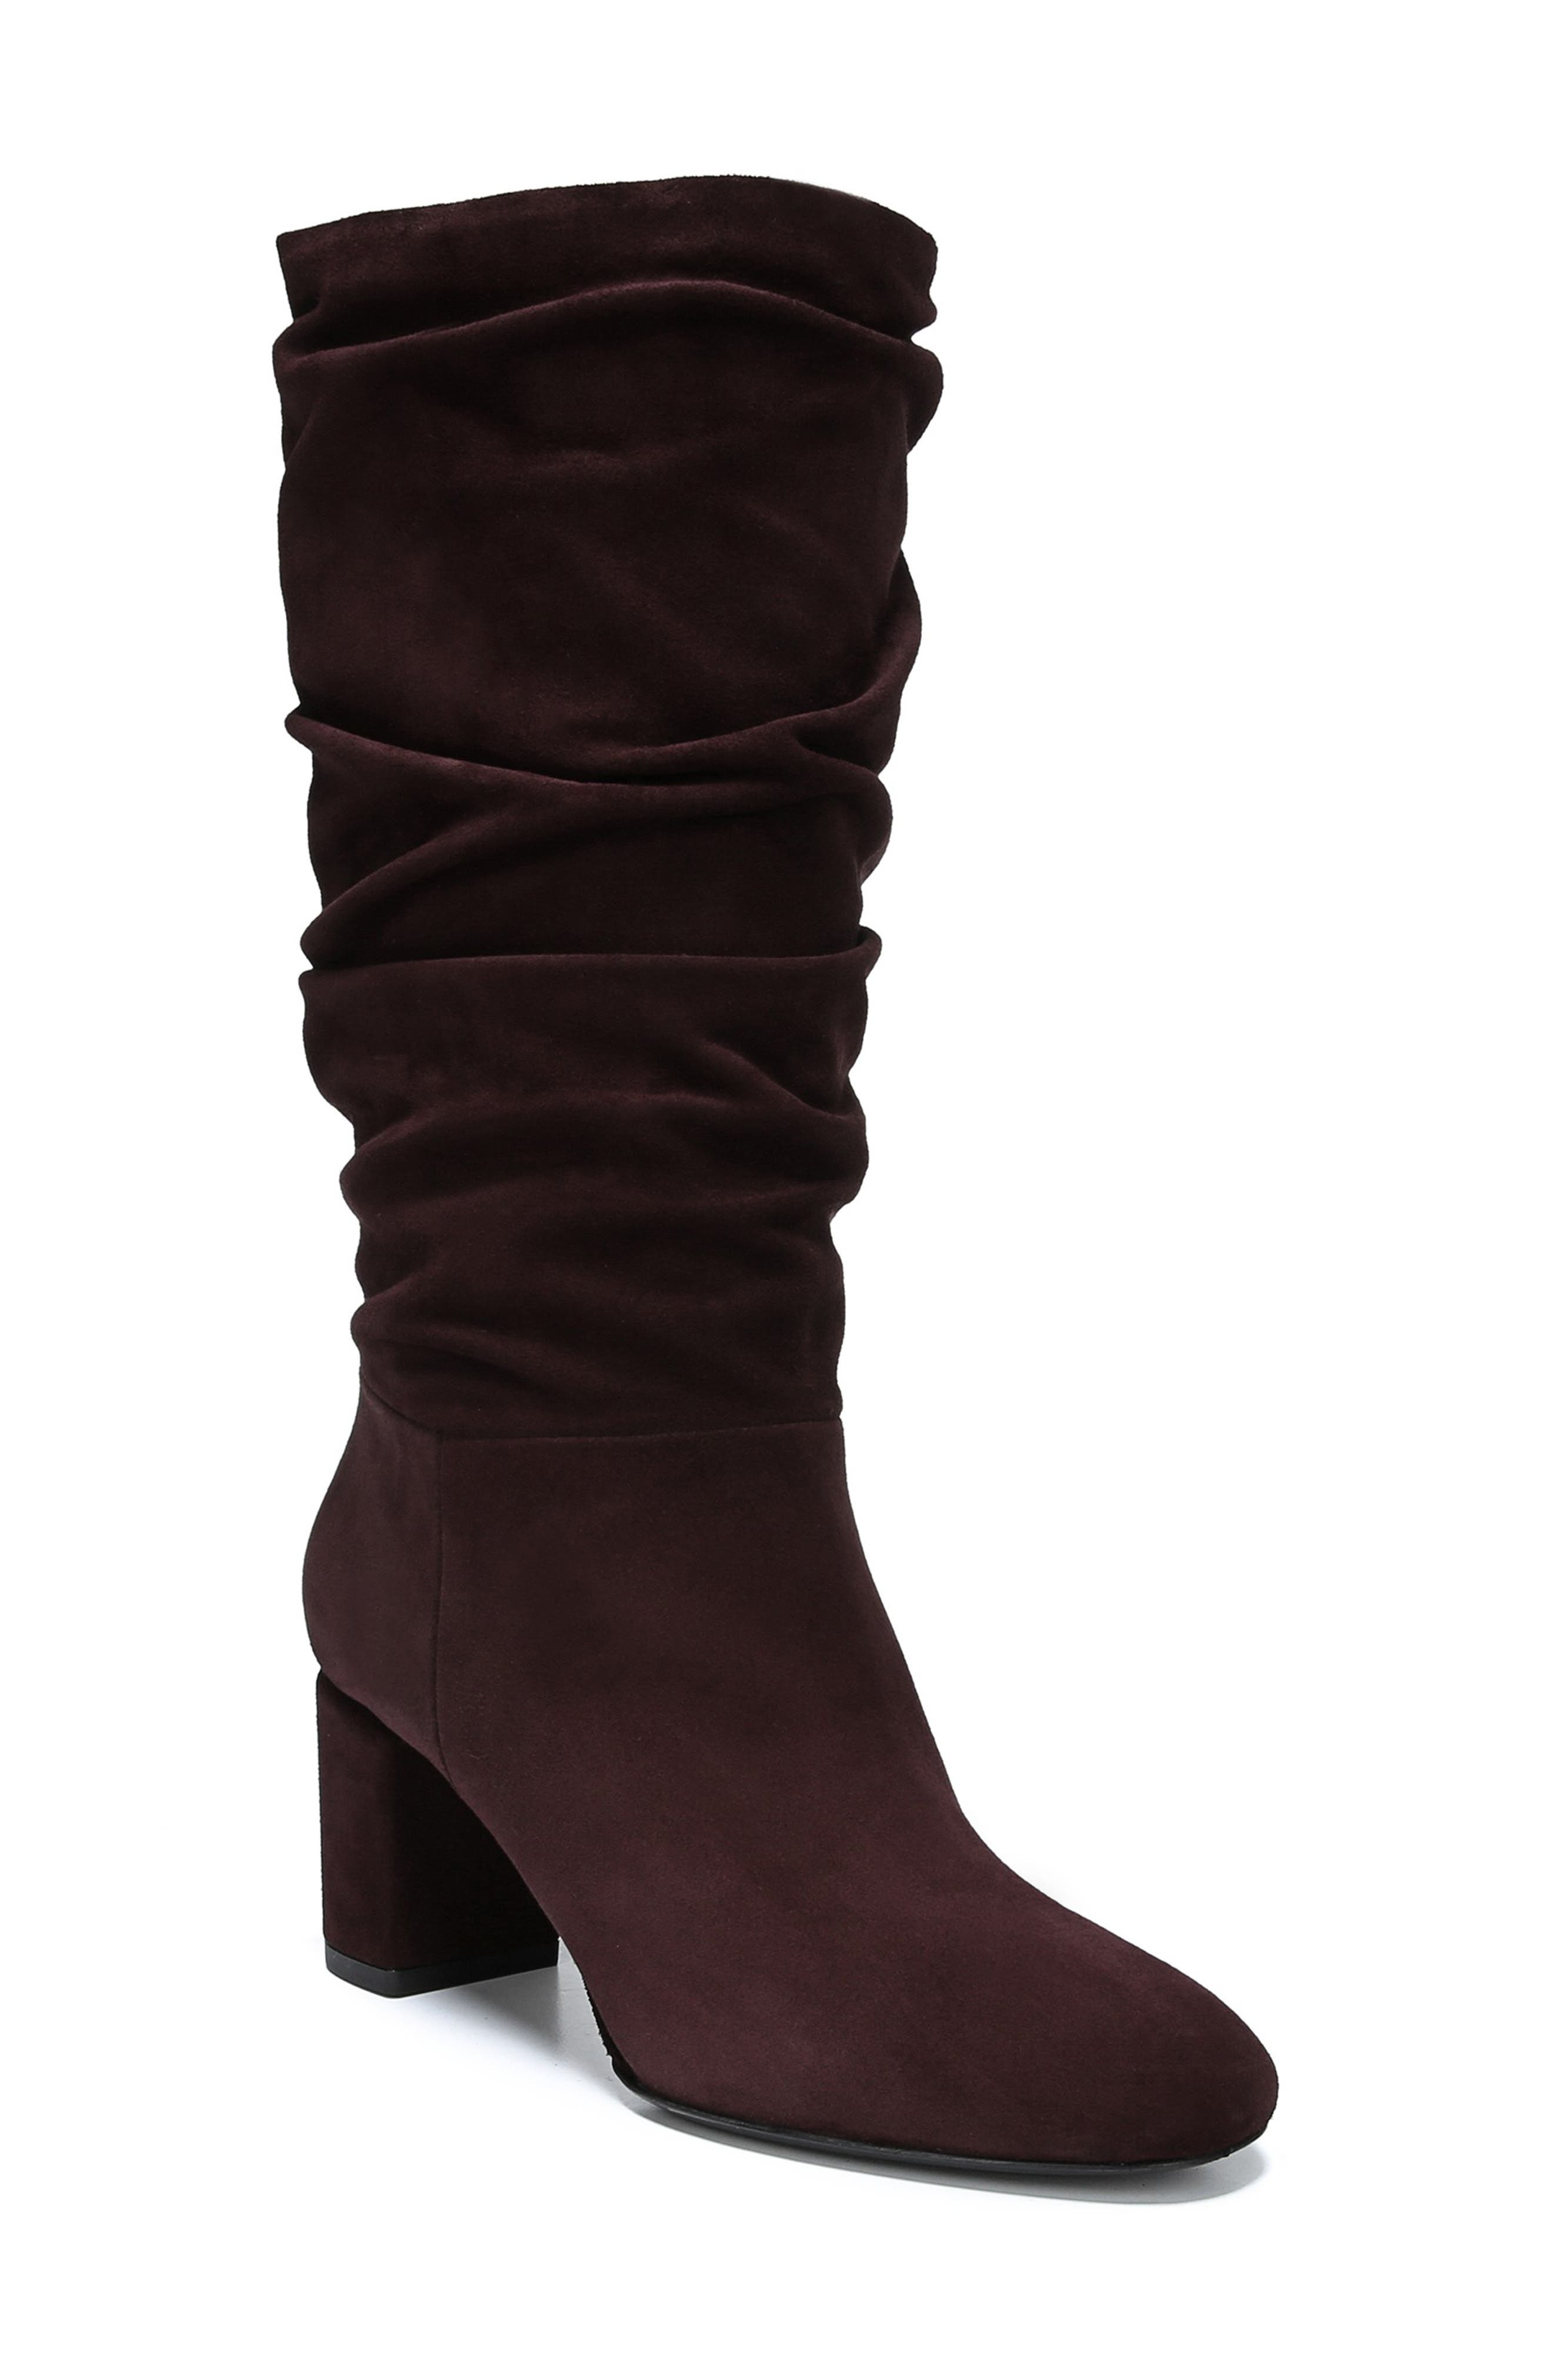 V-Naren Slouchy Boot, Main, color, 500